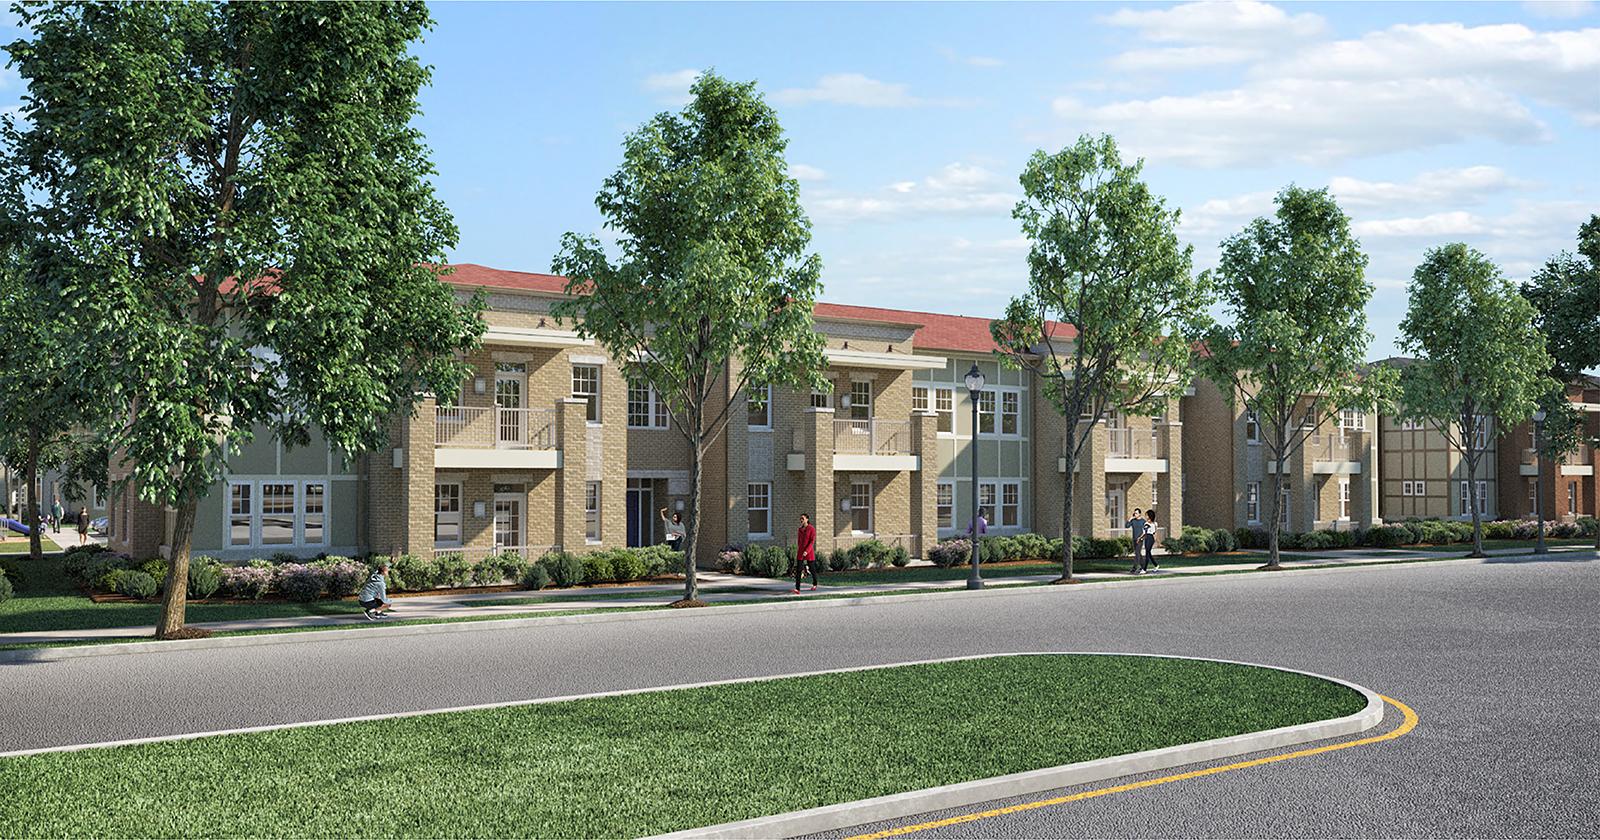 South City Choice Neighborhood Plan, Memphis, TN